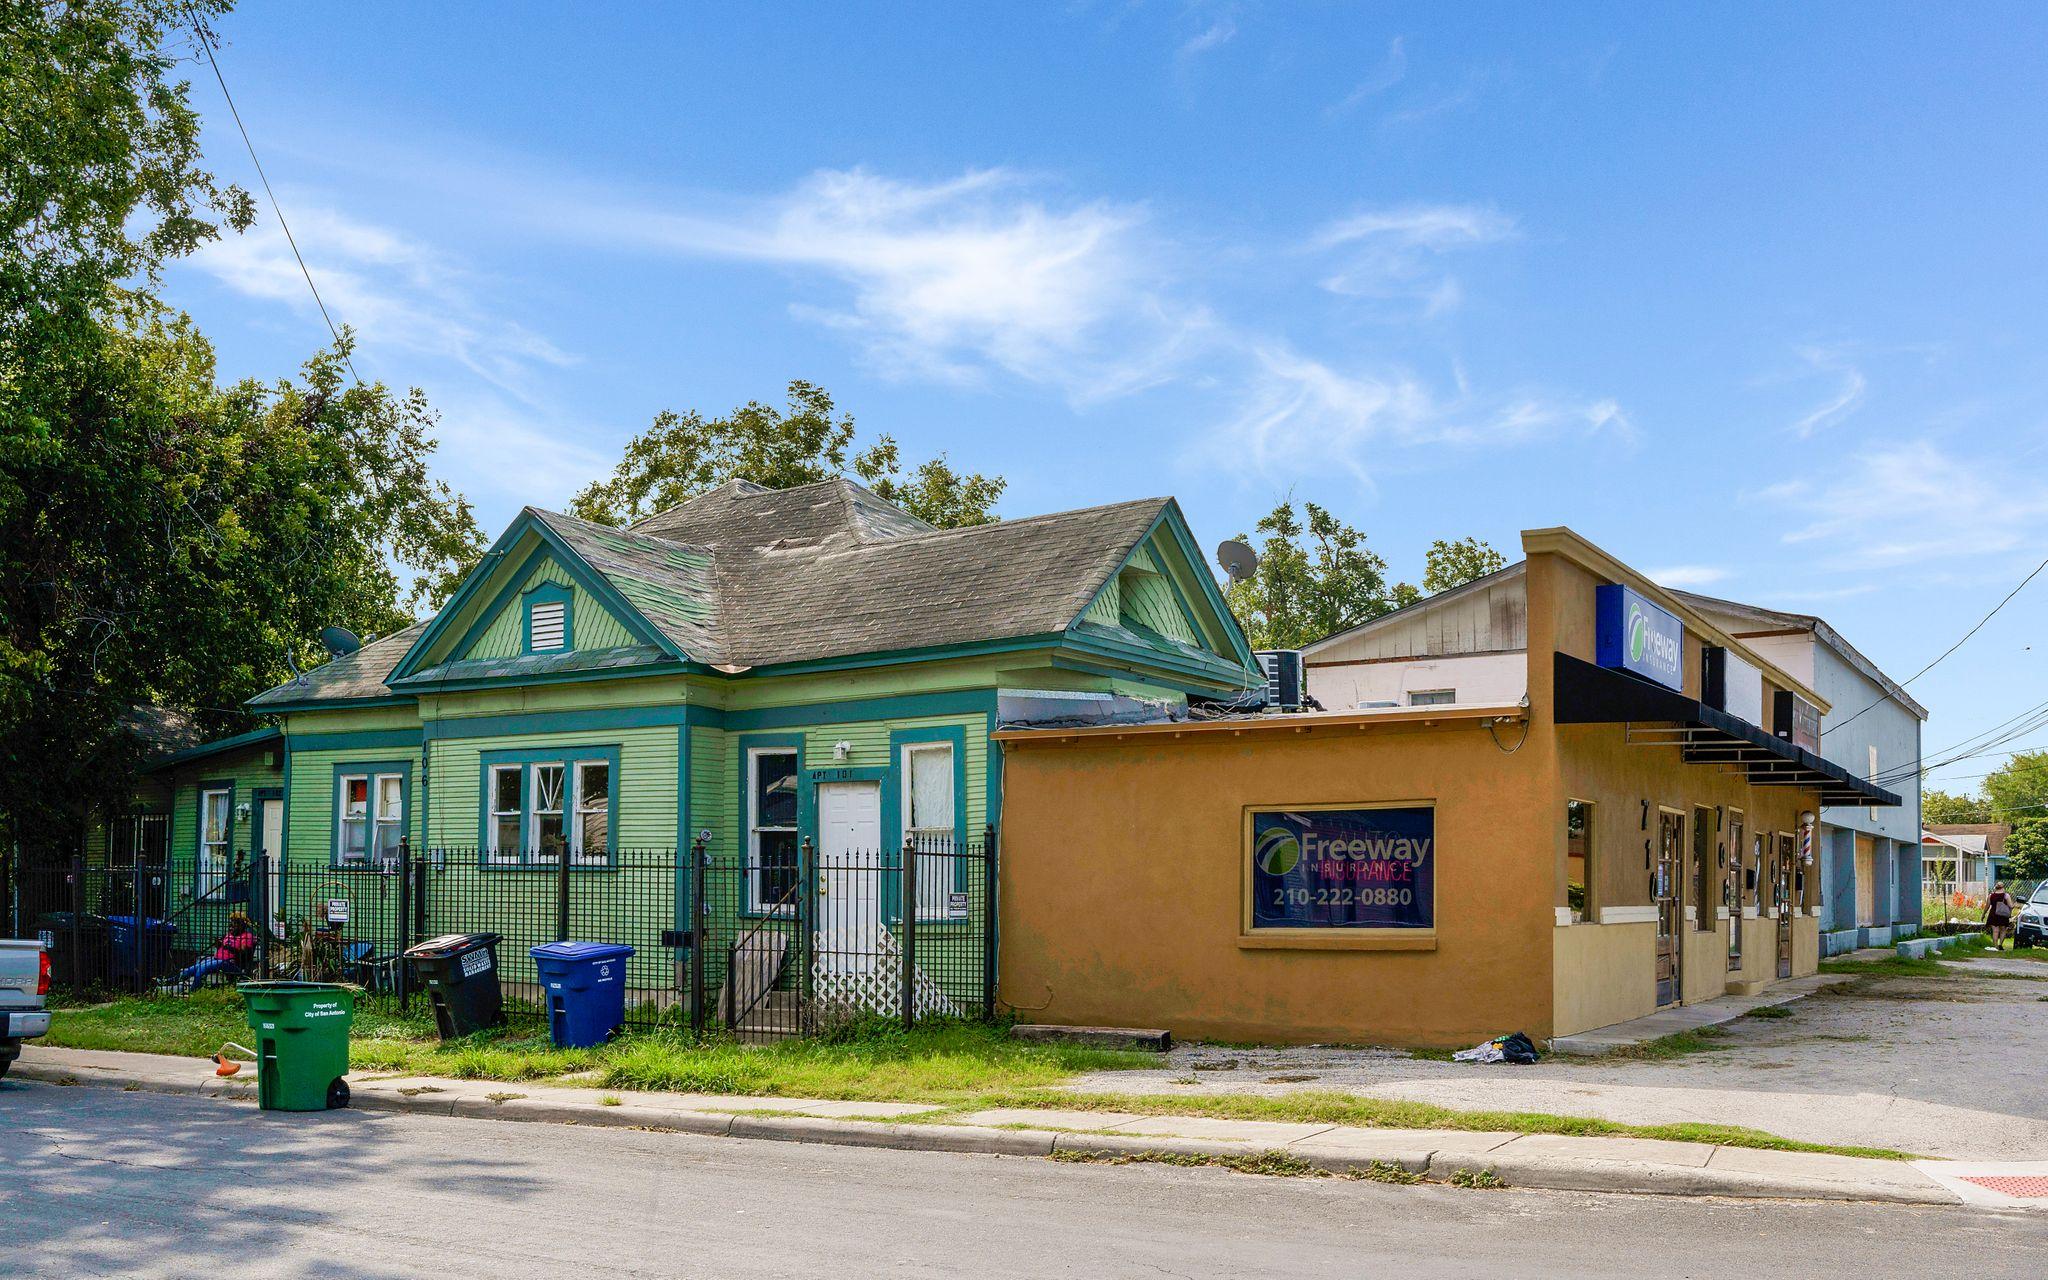 710 N New Braunfels Ave-105